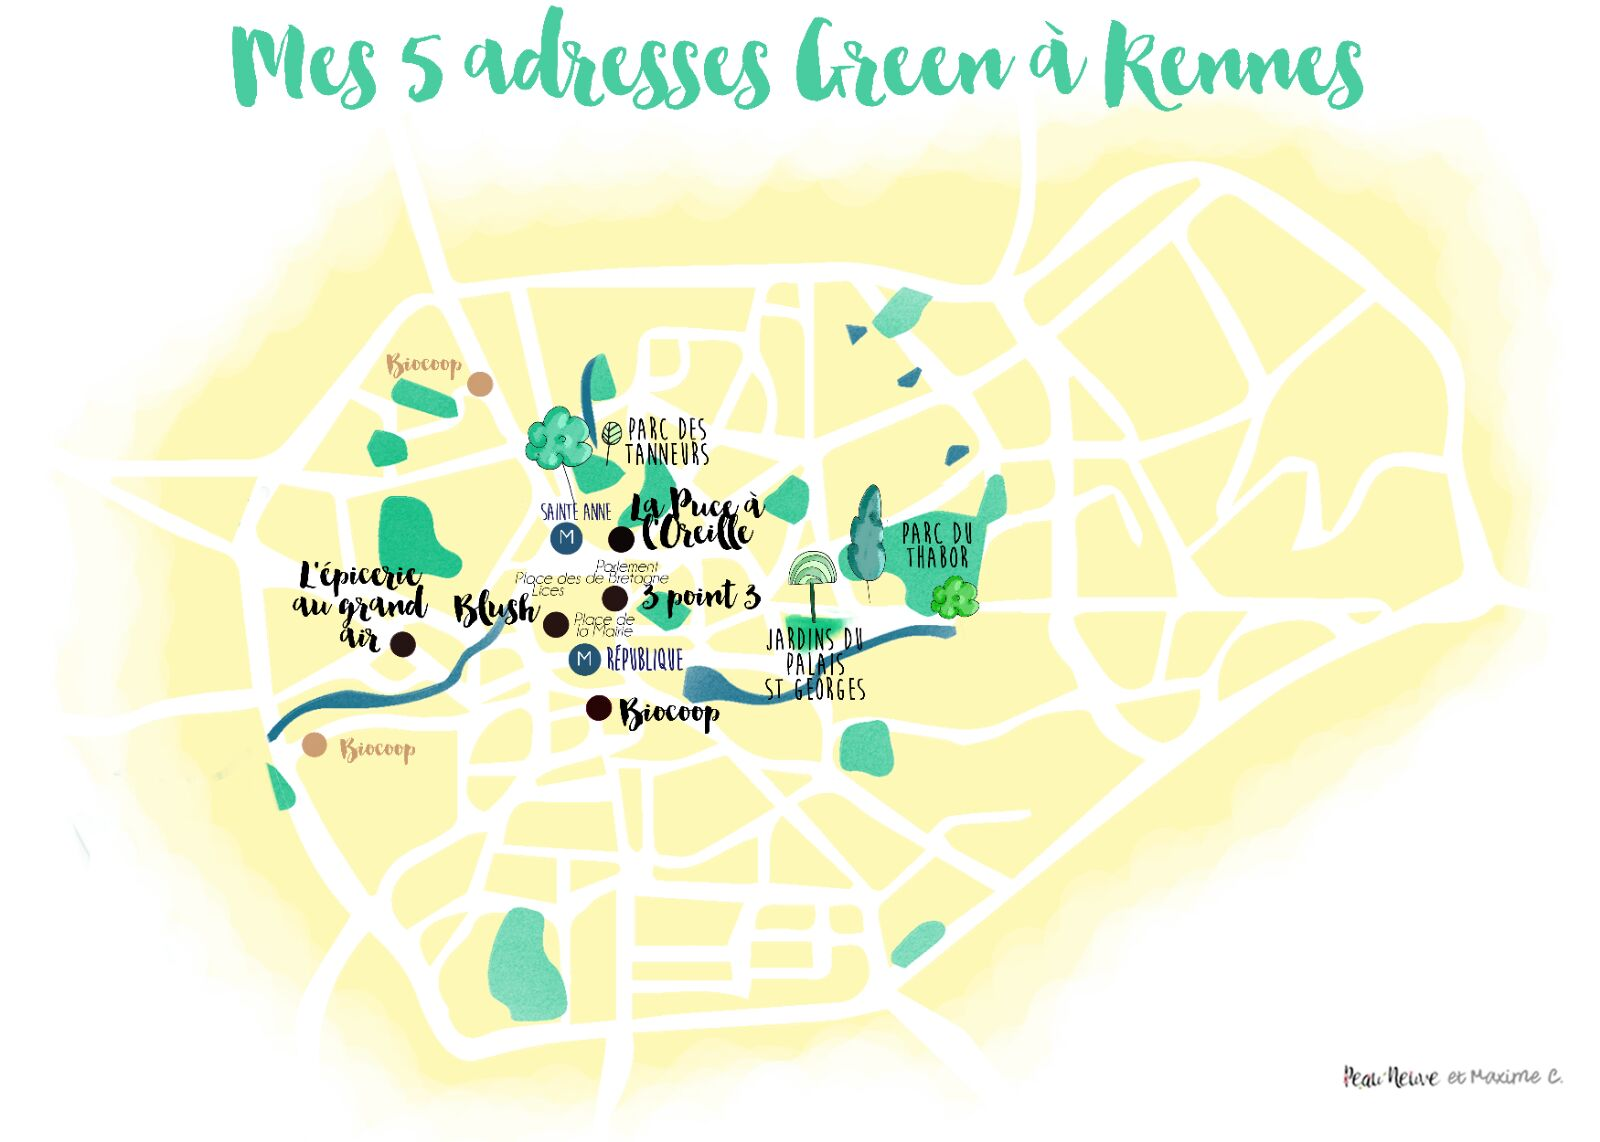 MES 5 ADRESSES GREEN À RENNES